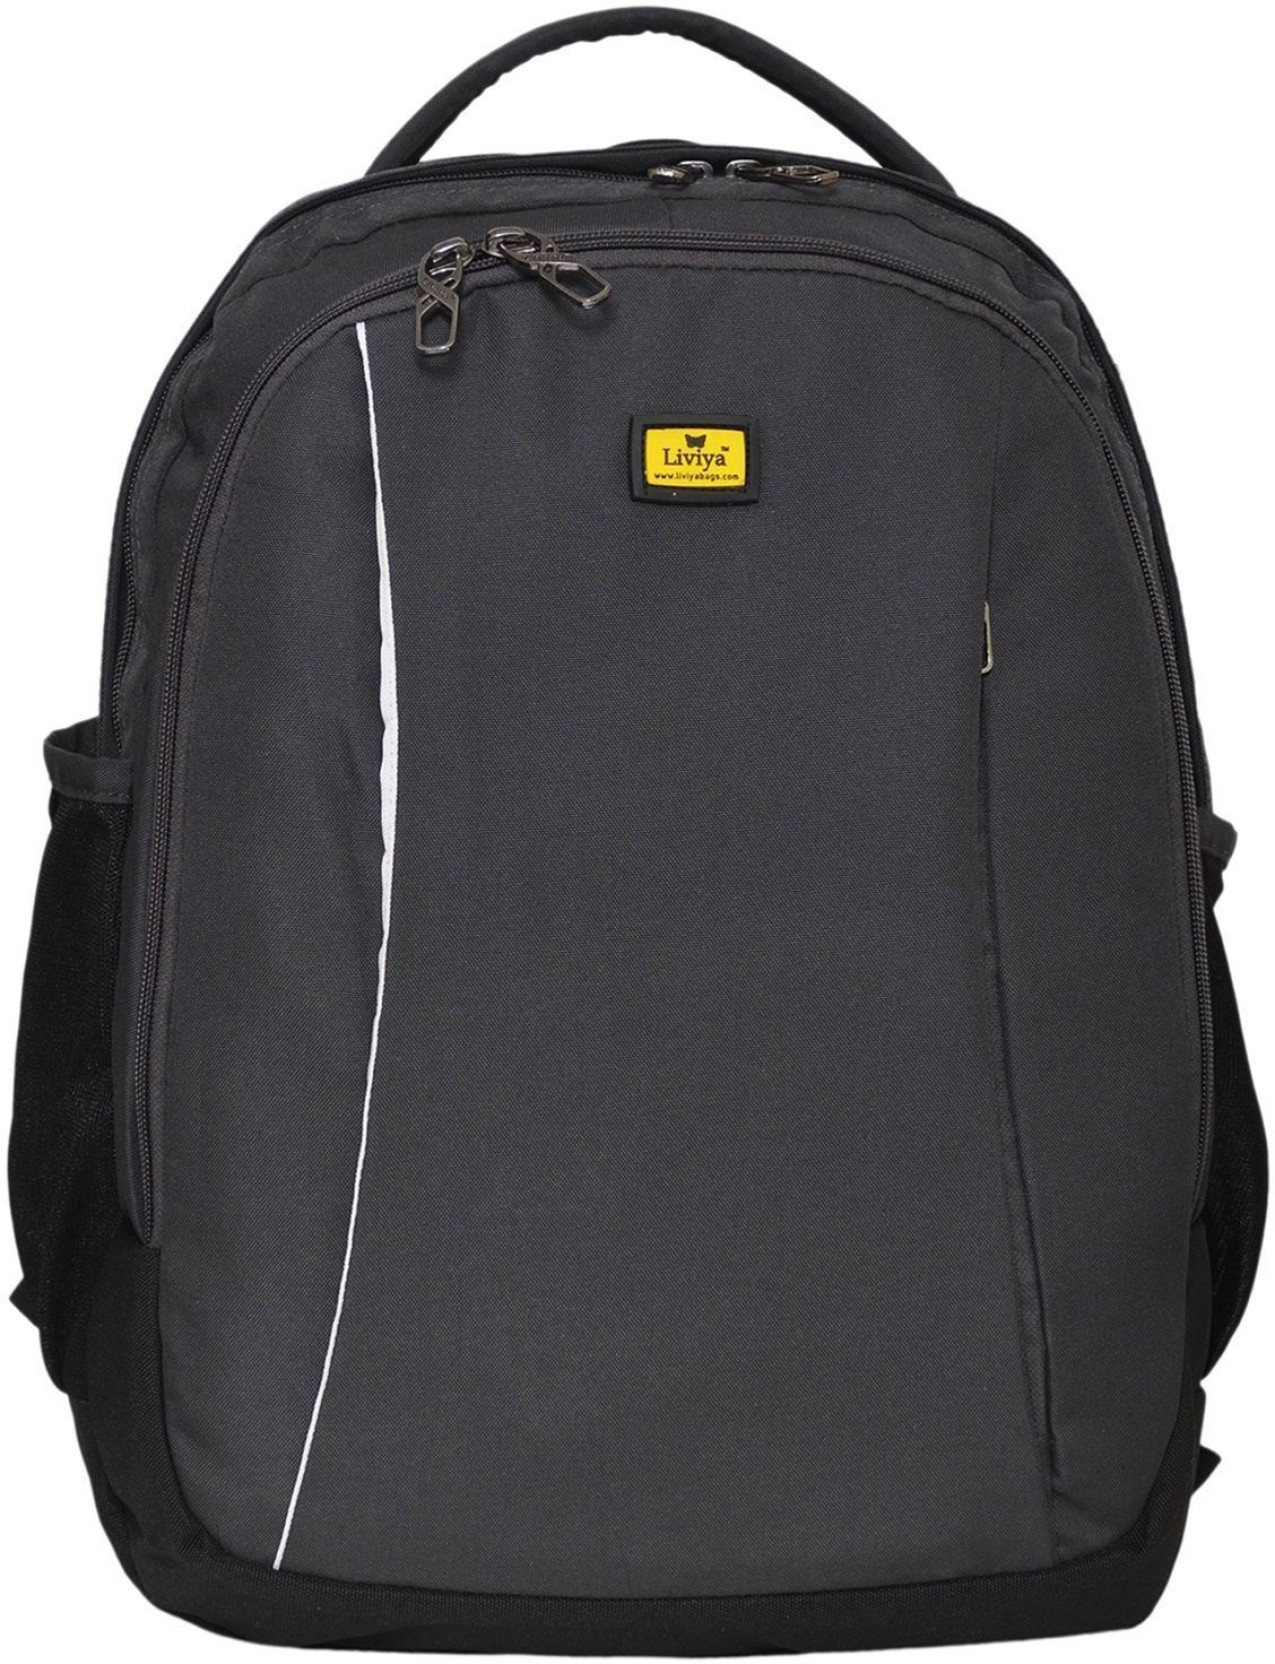 aca00c99314b Liviya SB-972 34 L Backpack Grey - Price in India